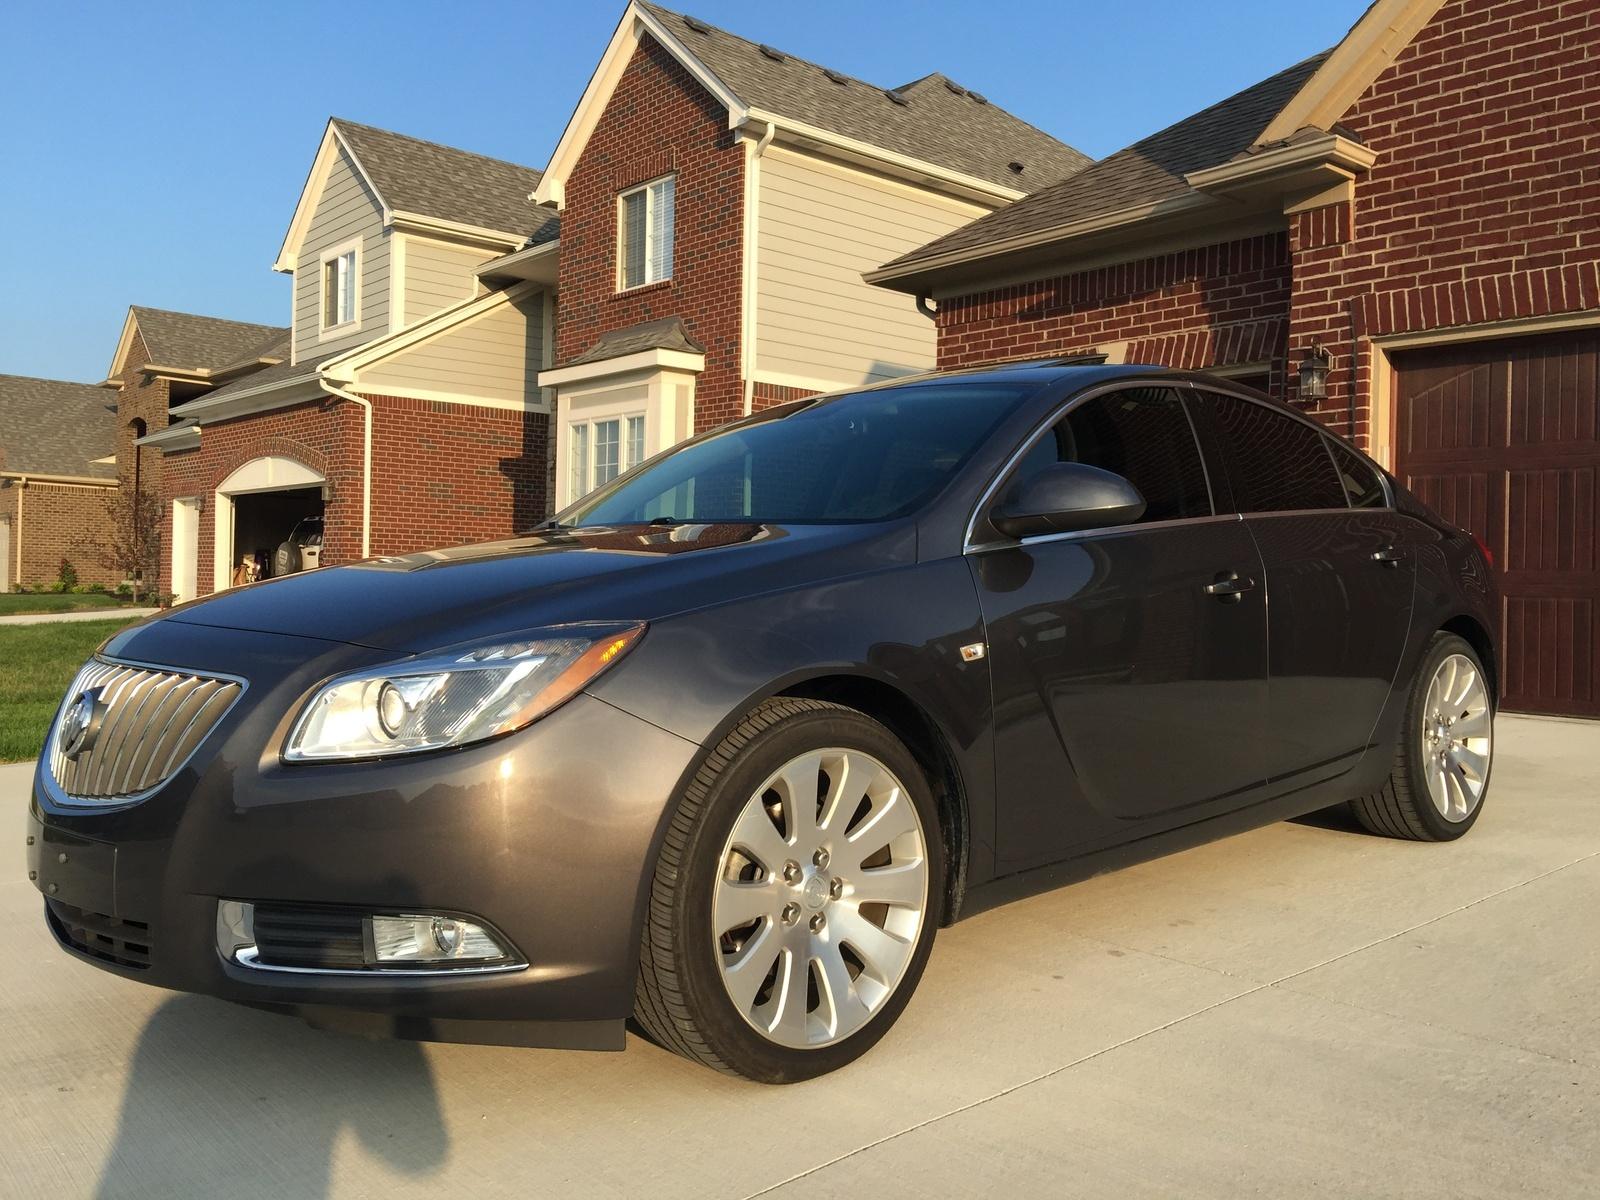 cxl original car review driver buick regal reviews photo s and